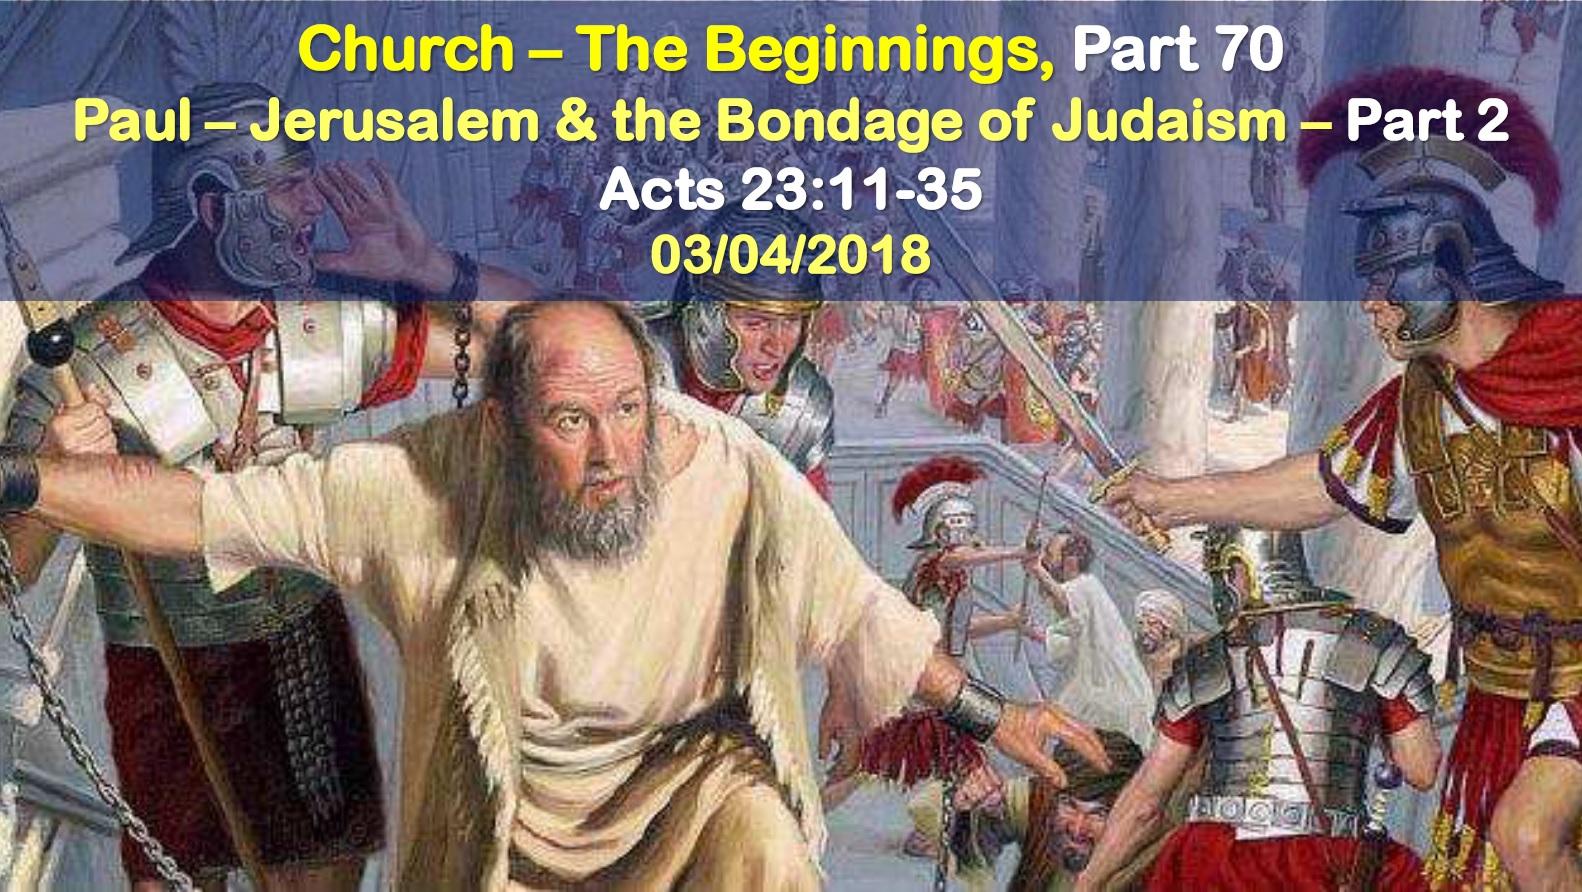 Paul - Jerusalem & the Bondage of Judaism - Part 2